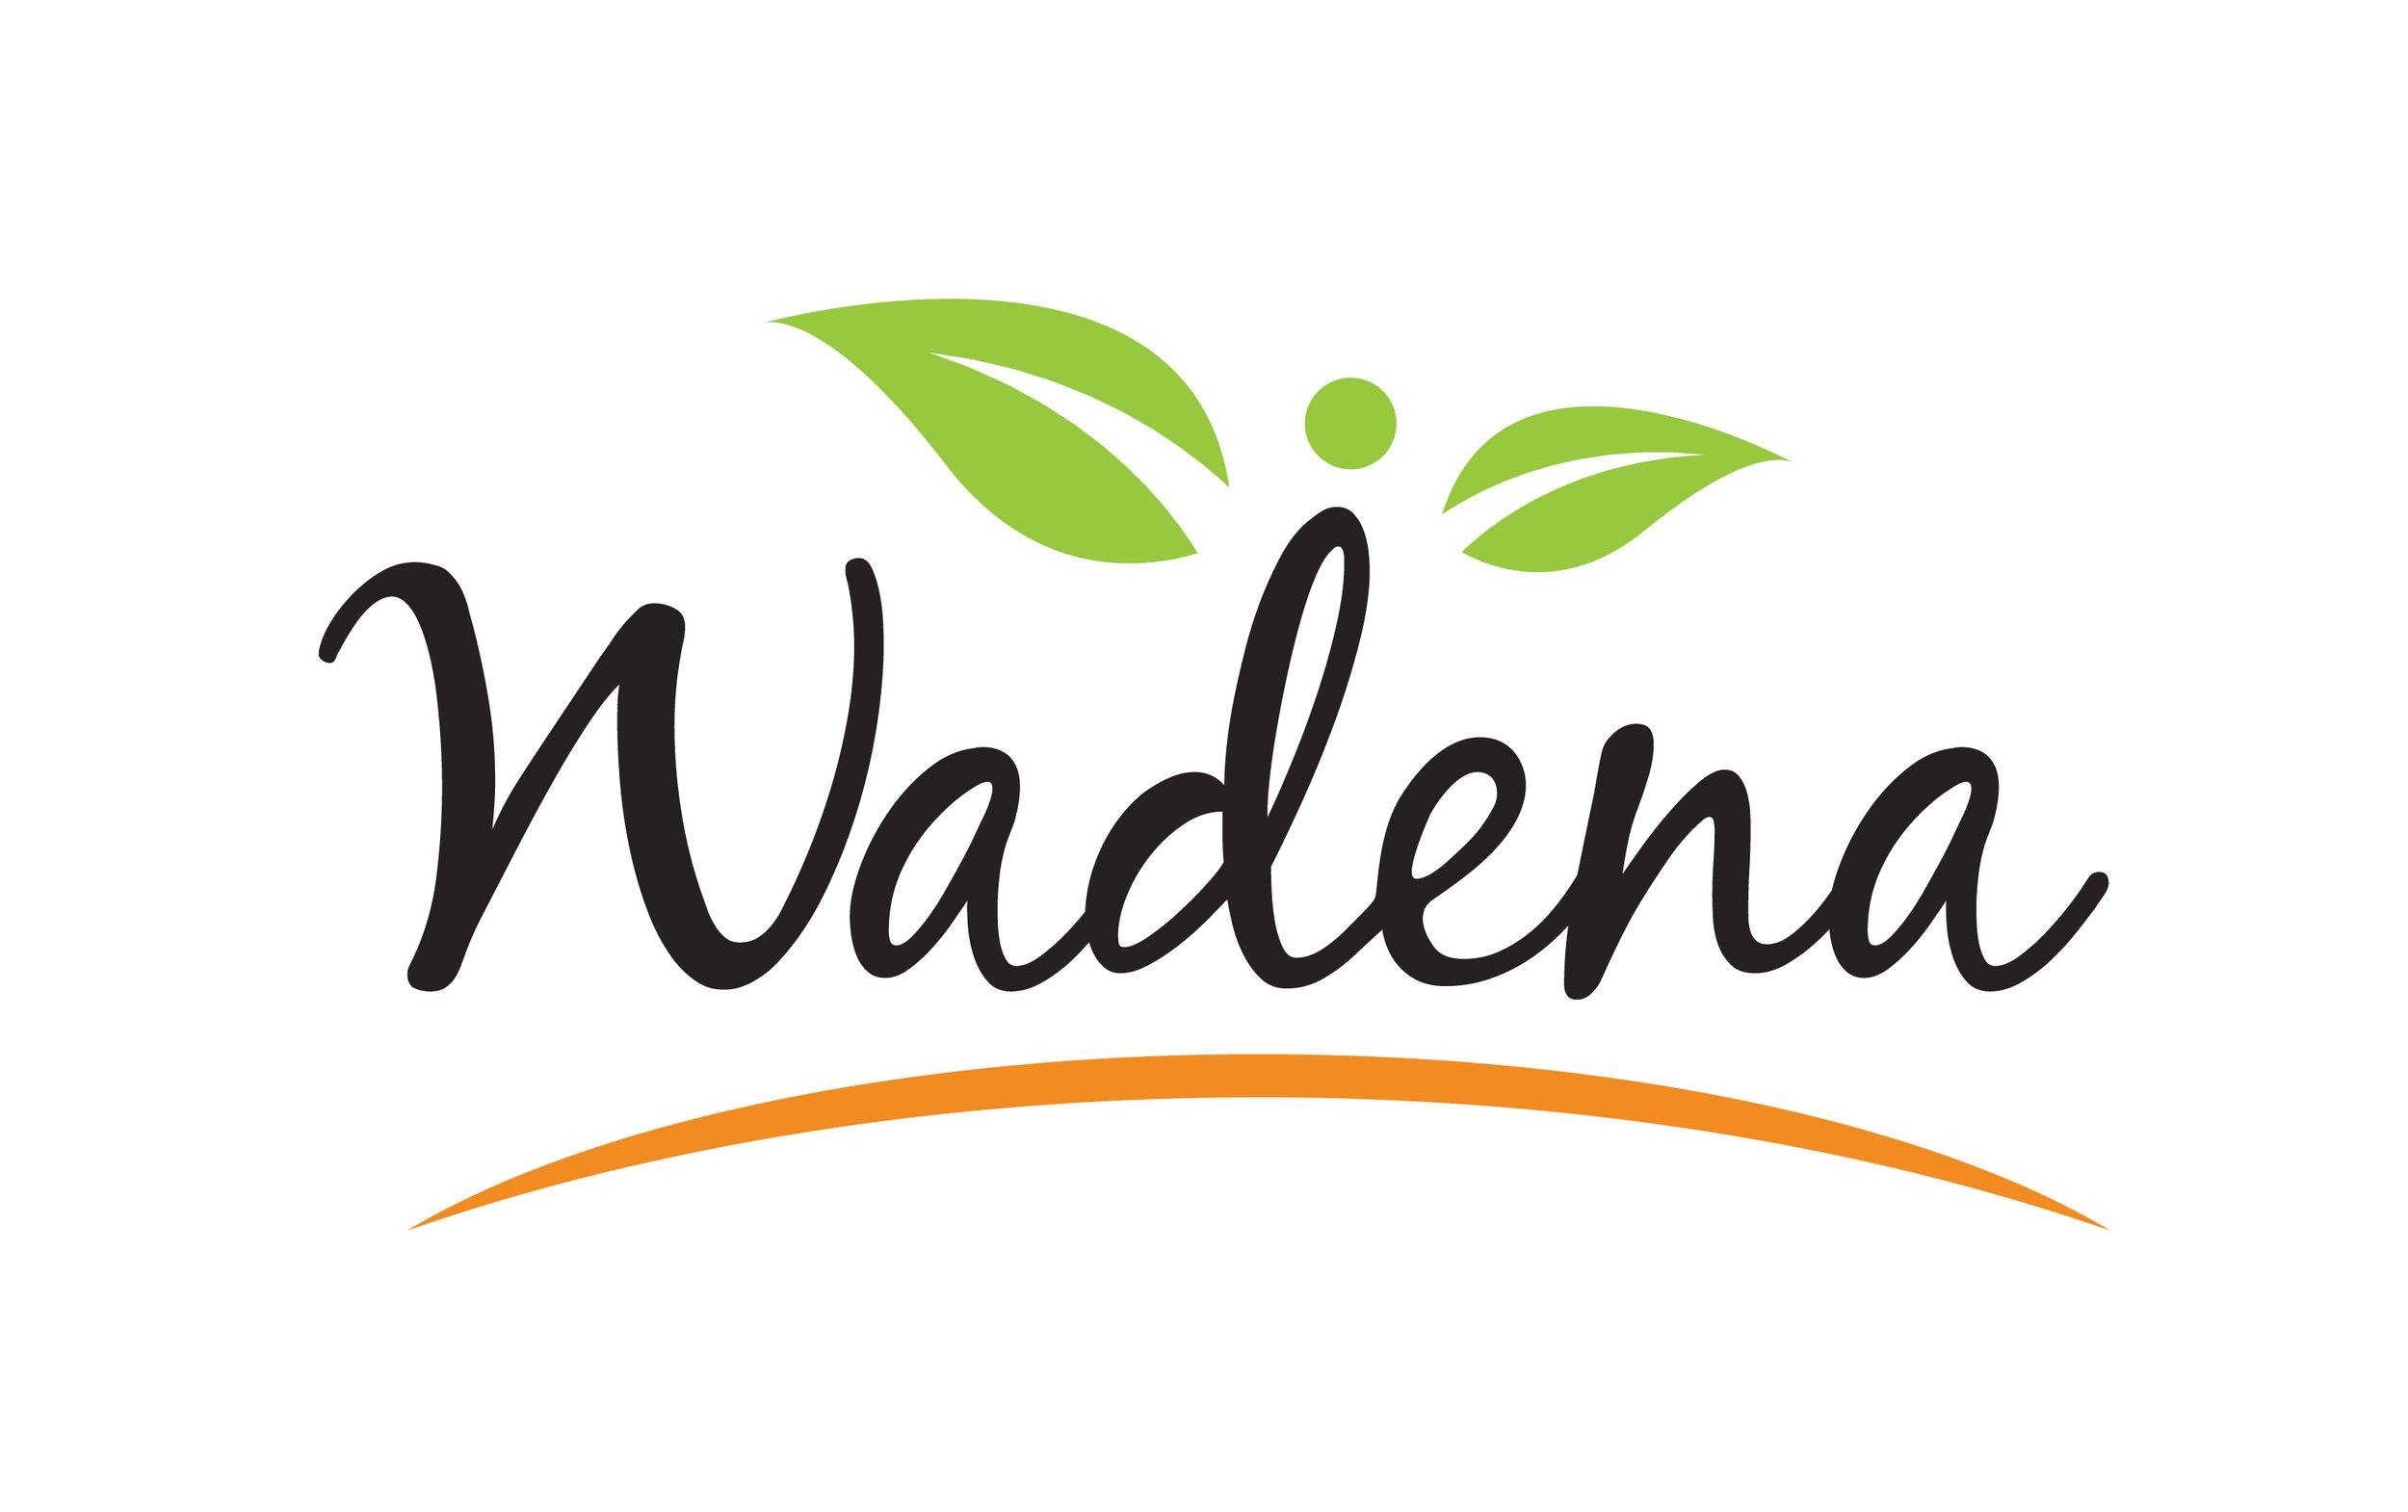 Logo design for town of Wadena